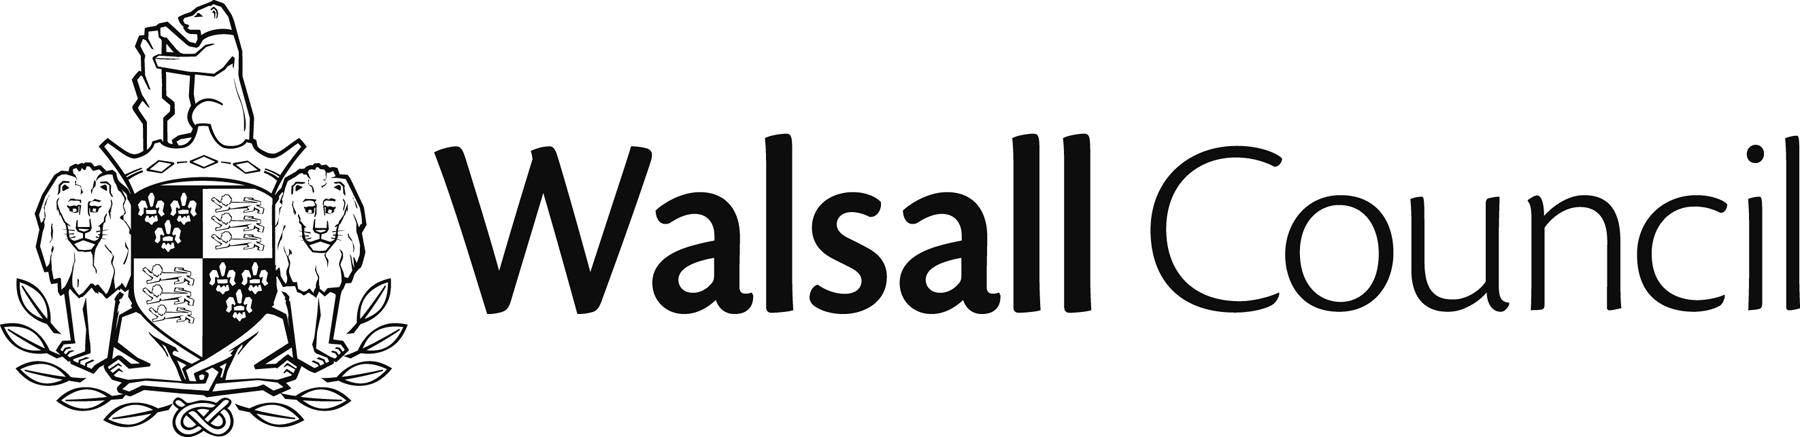 walsall-council-logo